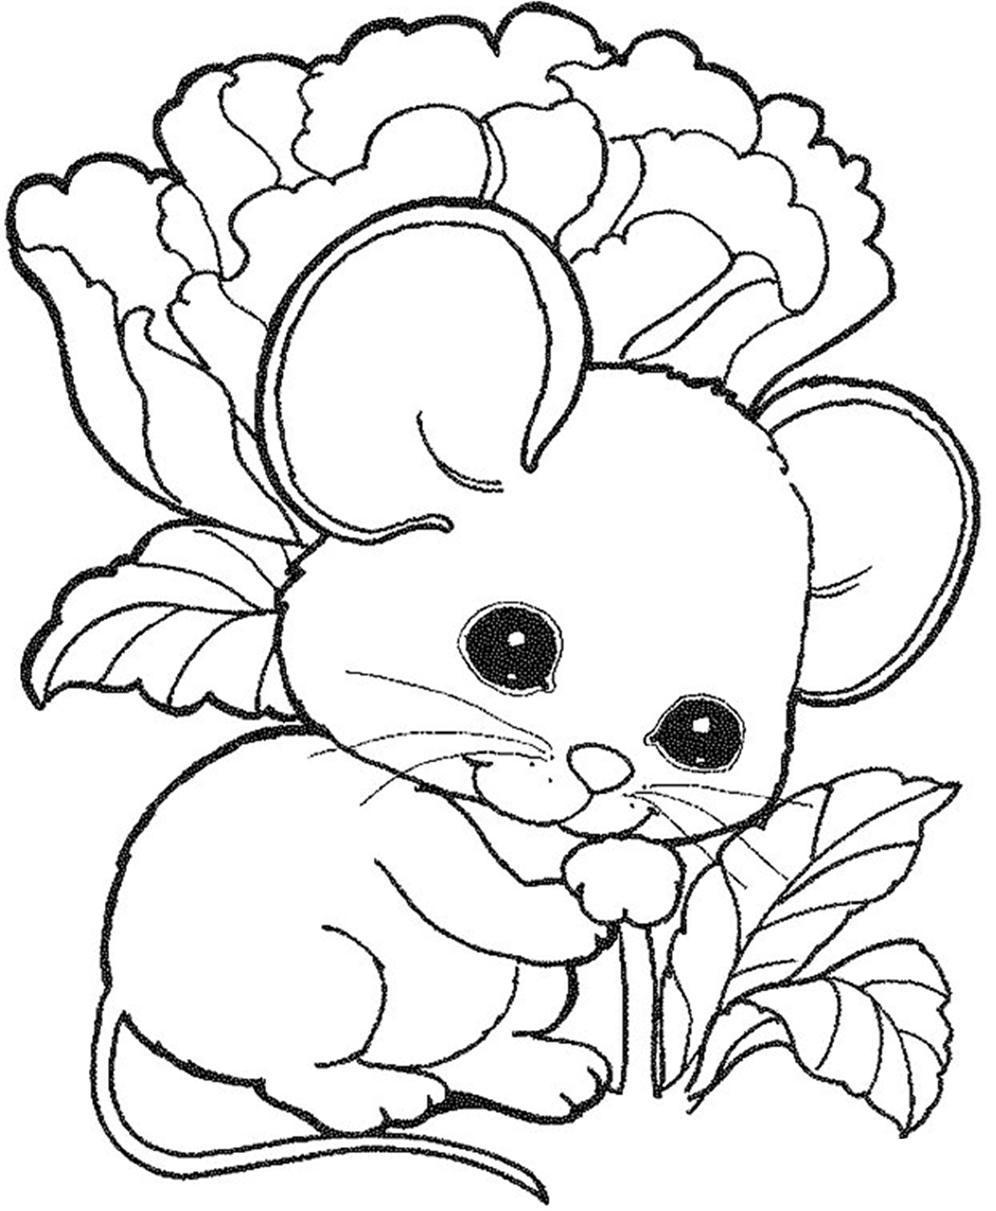 Mewarnai gambar tikus lucu sederhana 5